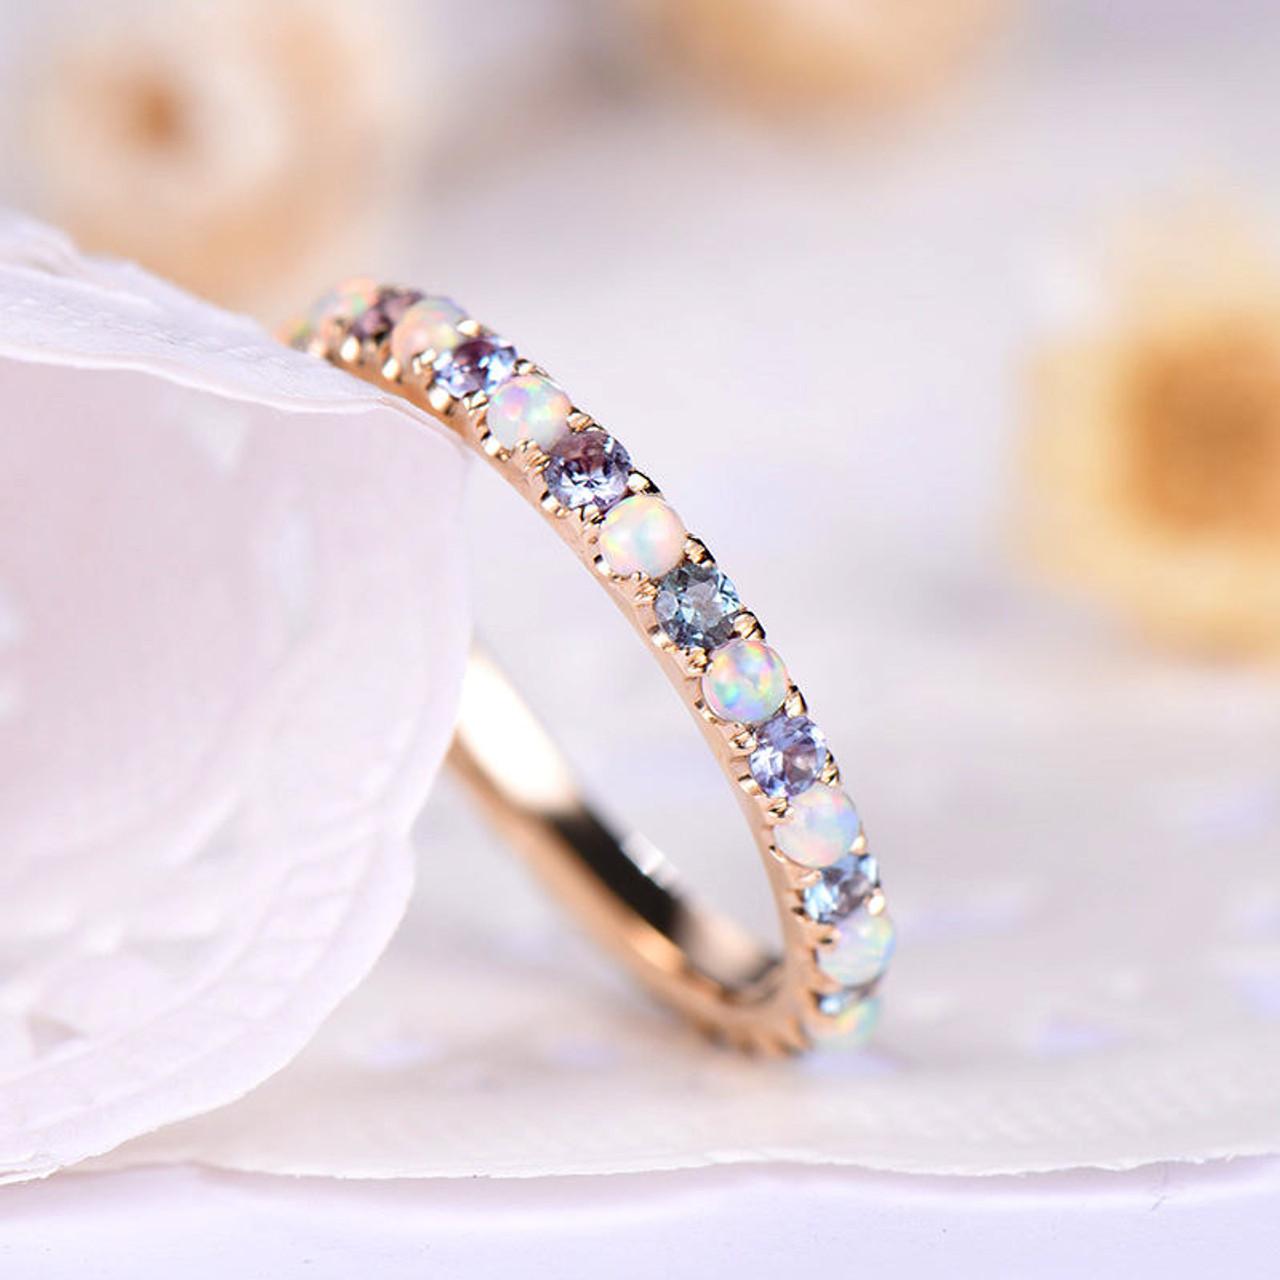 14k Yellow Gold Ring Settings